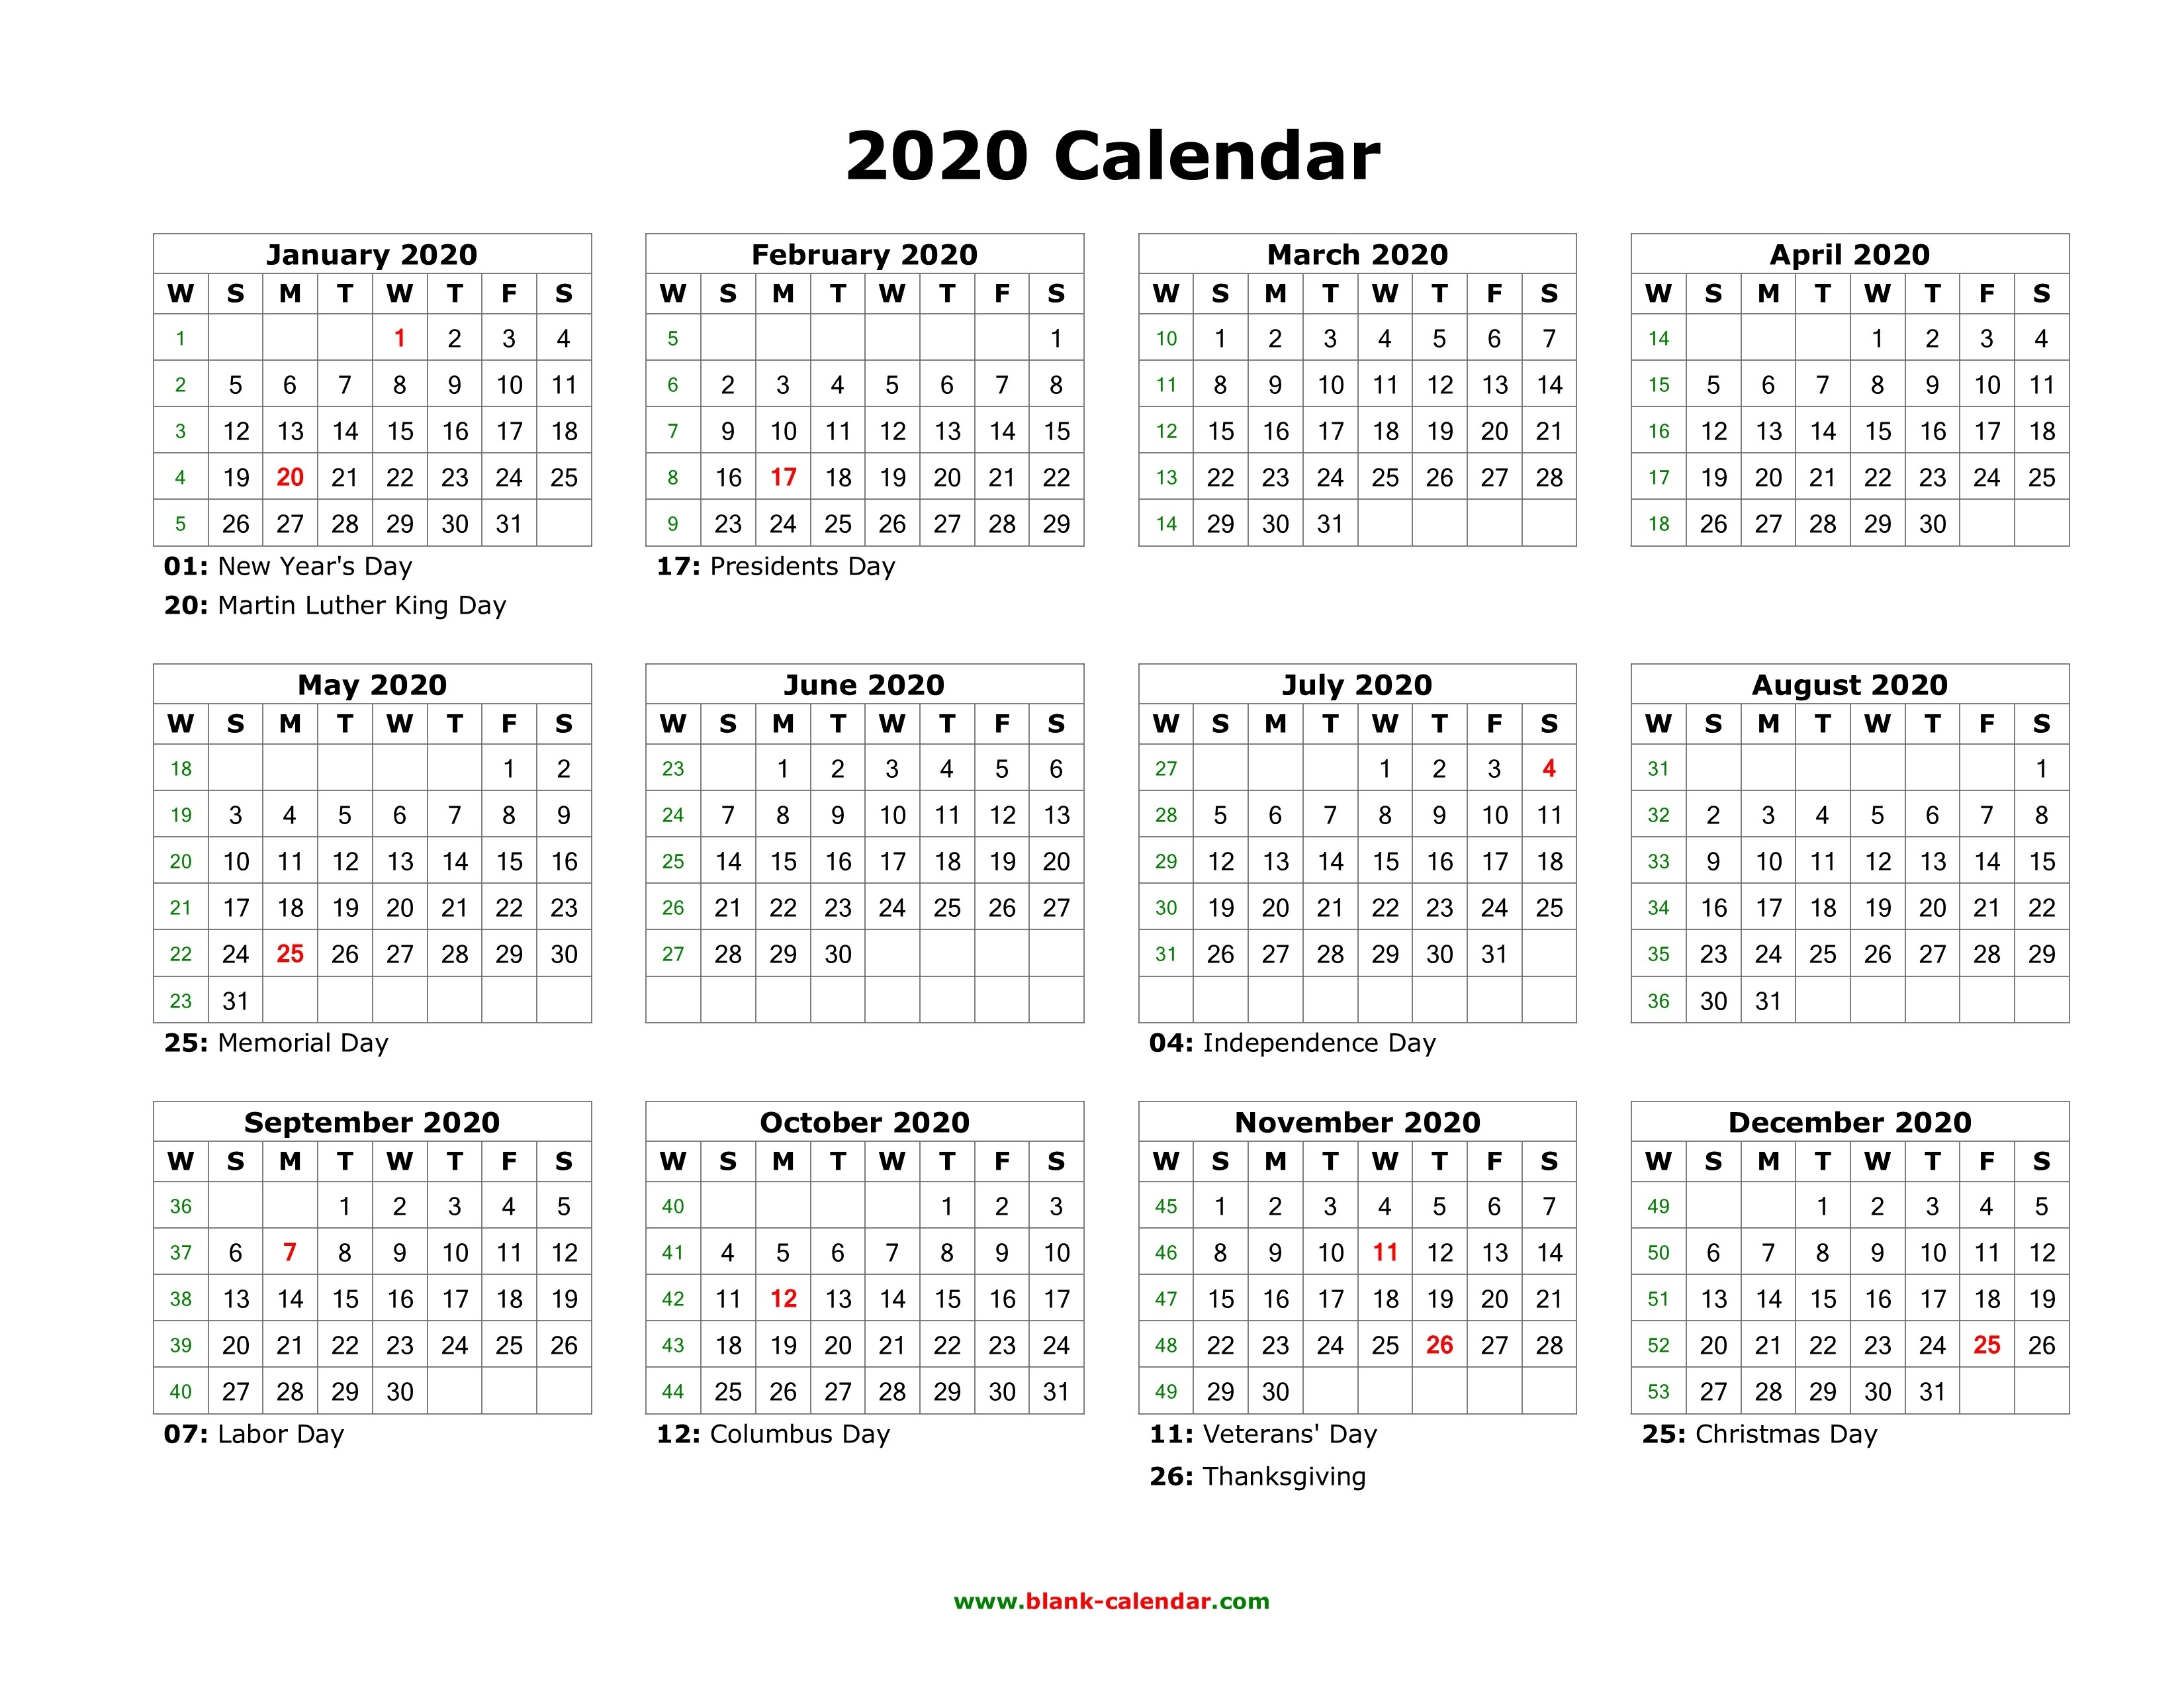 Blank Calendar 2020 | Free Download Calendar Templates-3 Month Editable Calendar 2020 Template